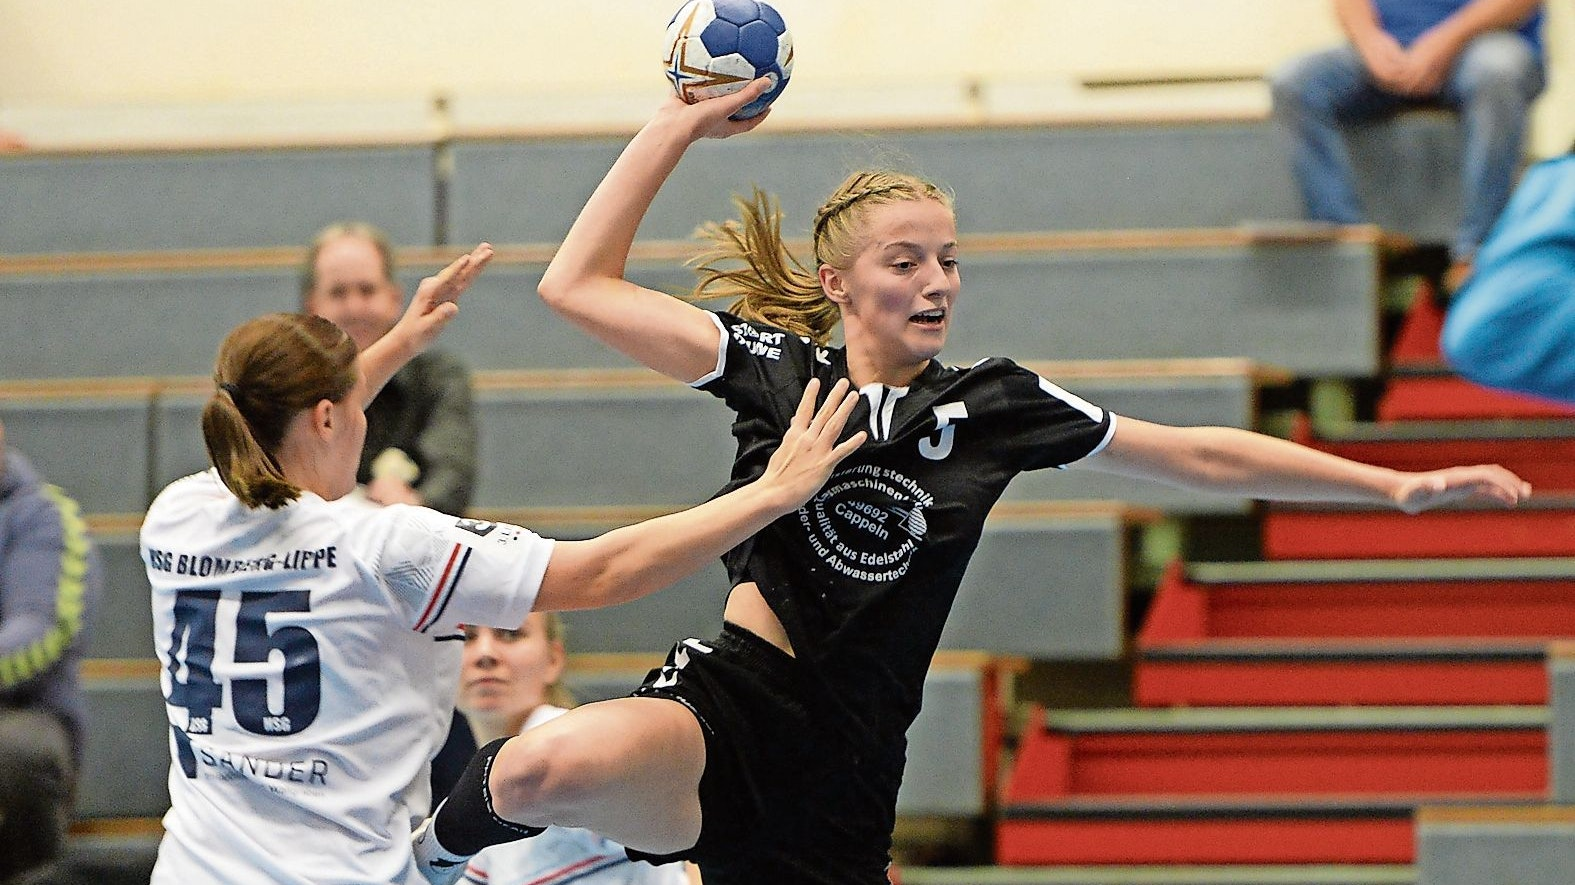 Youngster aus eigenen Reihen: Dina Reinold (am Ball) darf zwar noch in der Garreler A-Jugend spielen, gehört aber bereits dem Drittligakader der BVG-Frauen an. Foto: Langosch